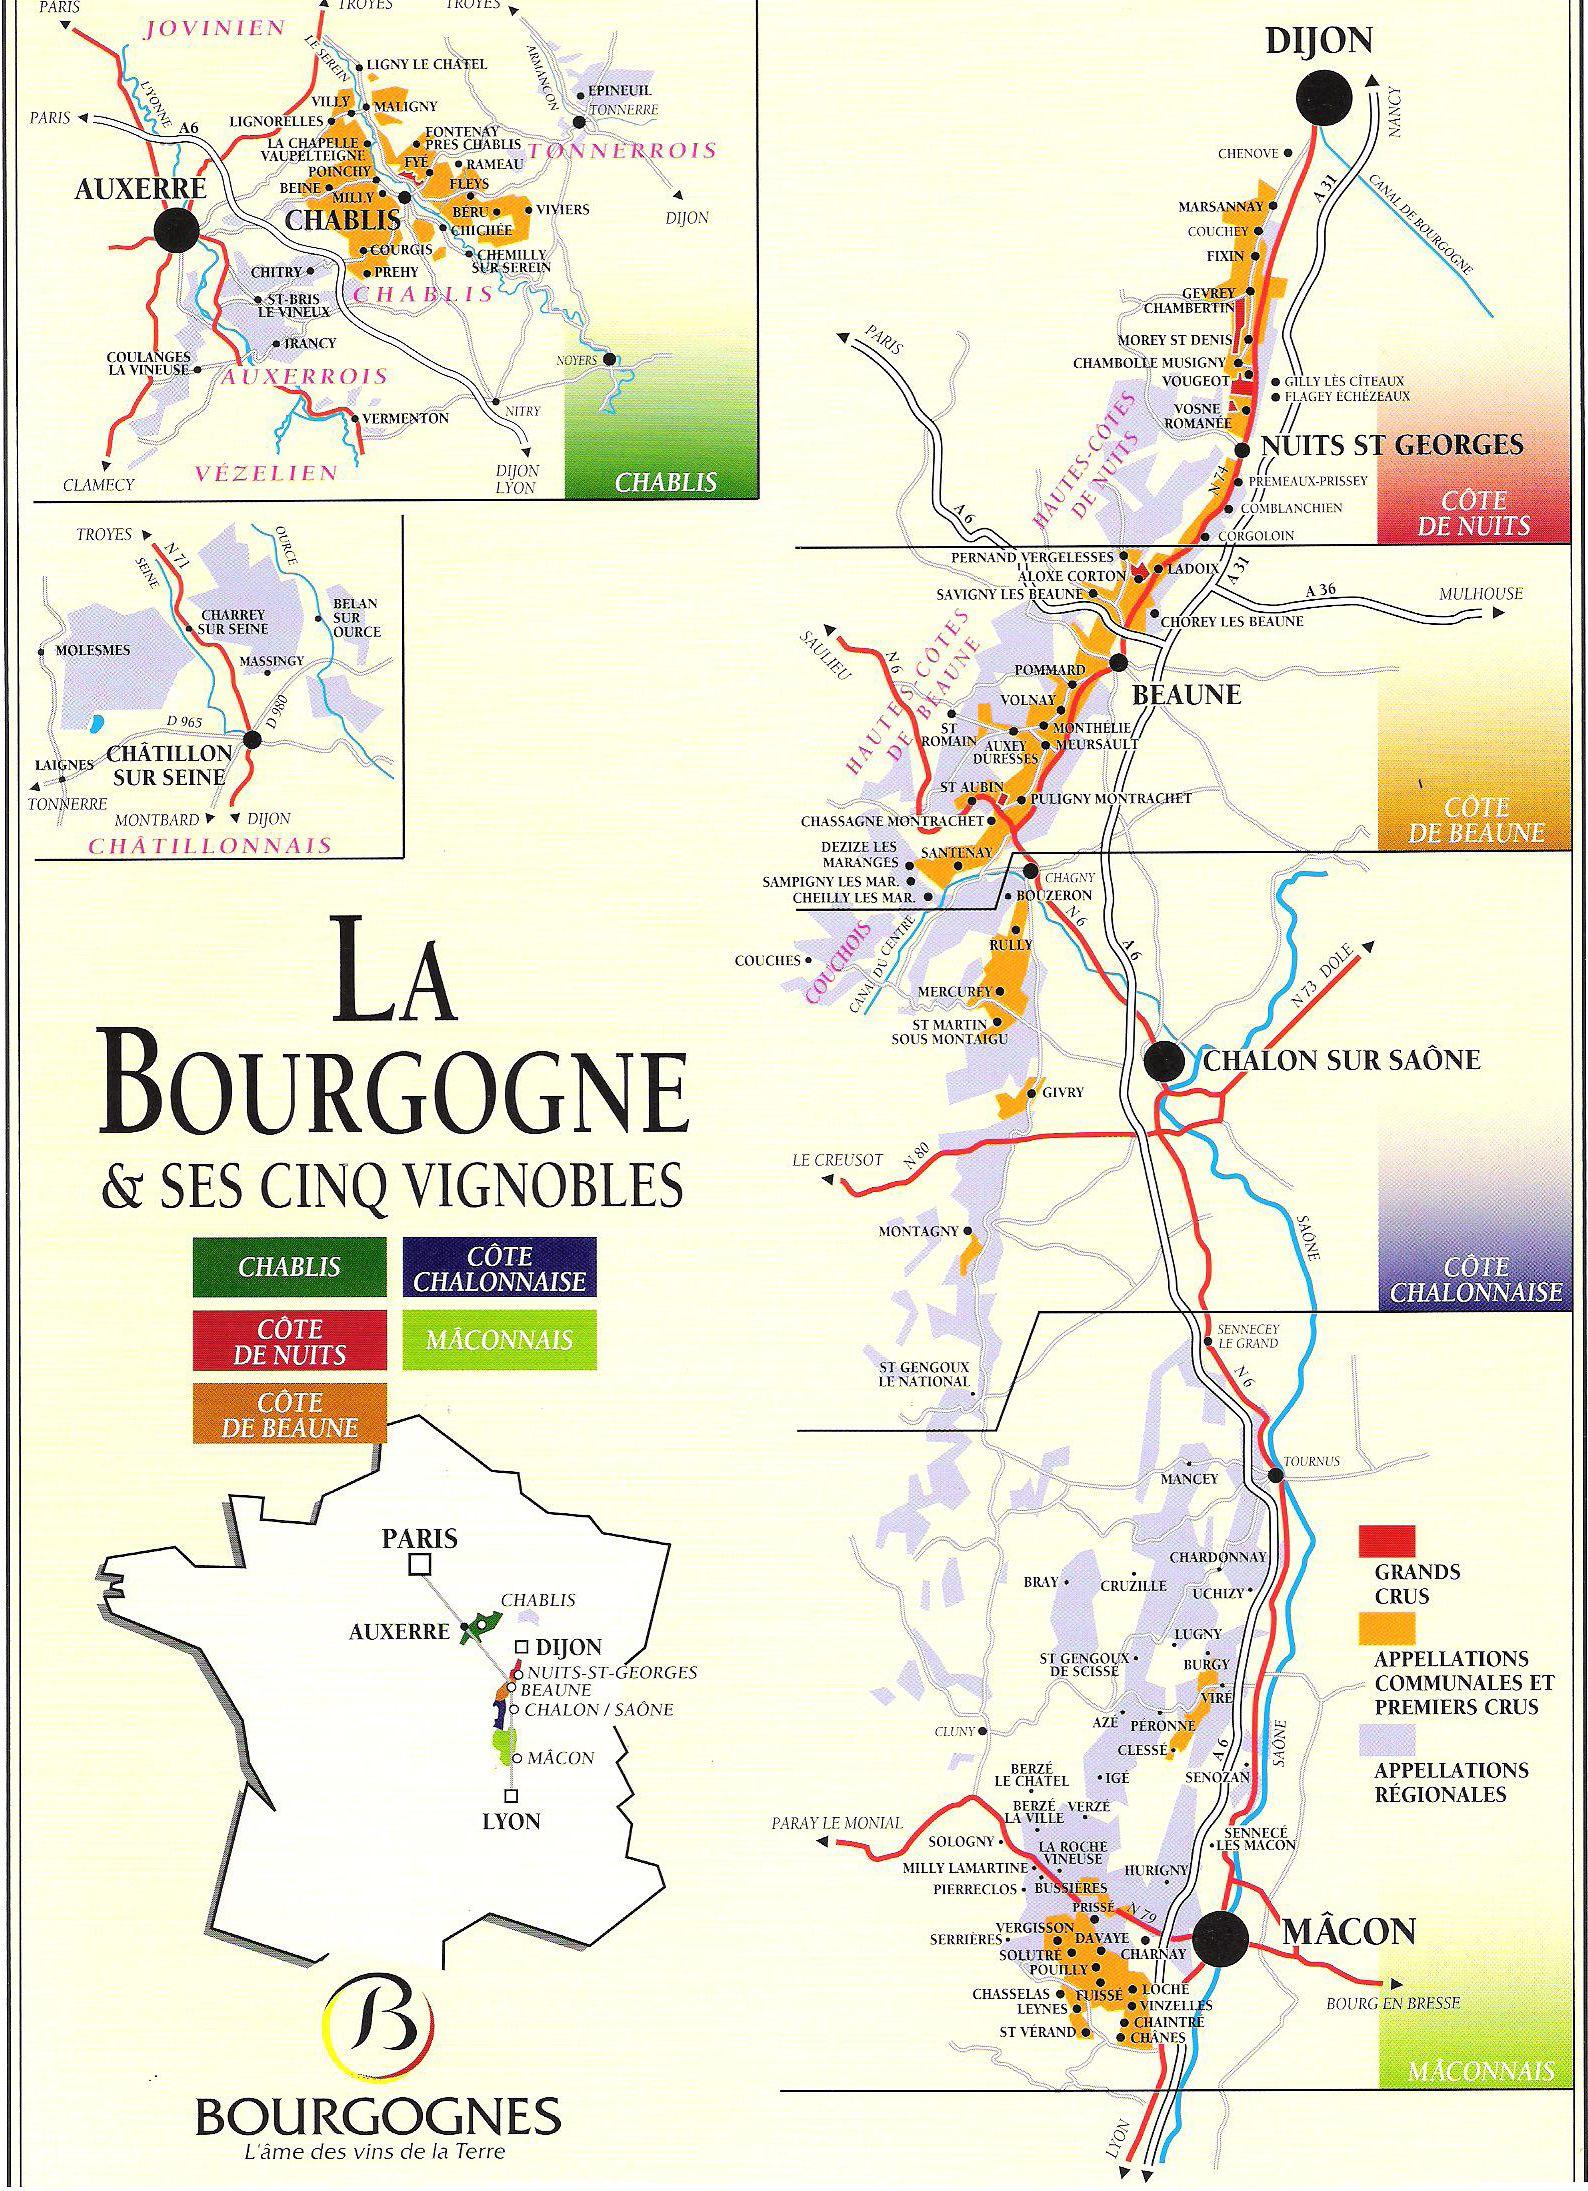 Carte Bourgogne Viticole.Geograohie De La Bourgogne Vin Vino De Francia Maridaje De